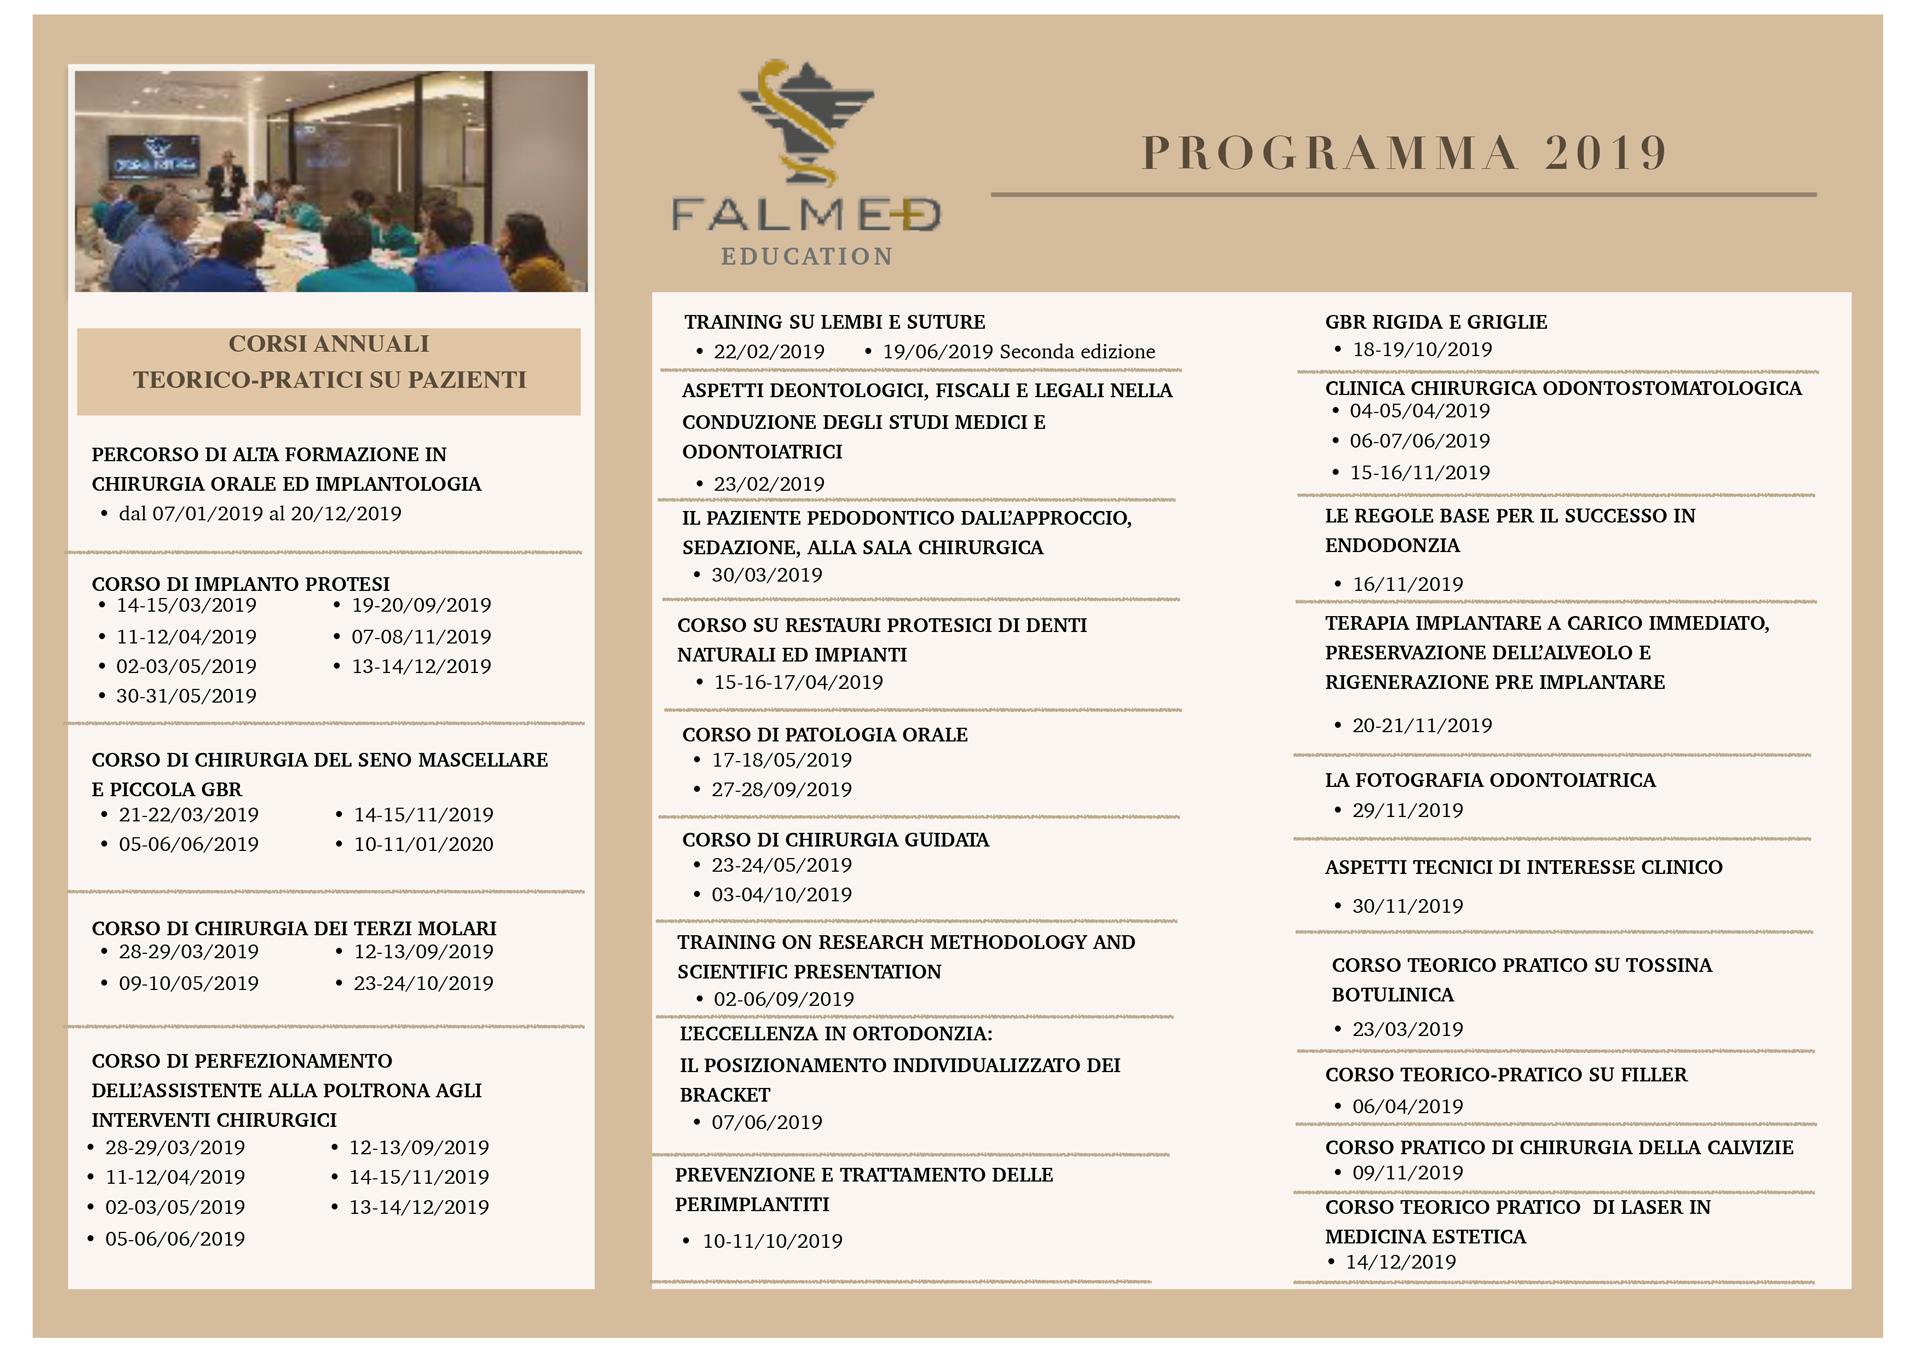 Elenco corsi FALMED 2019